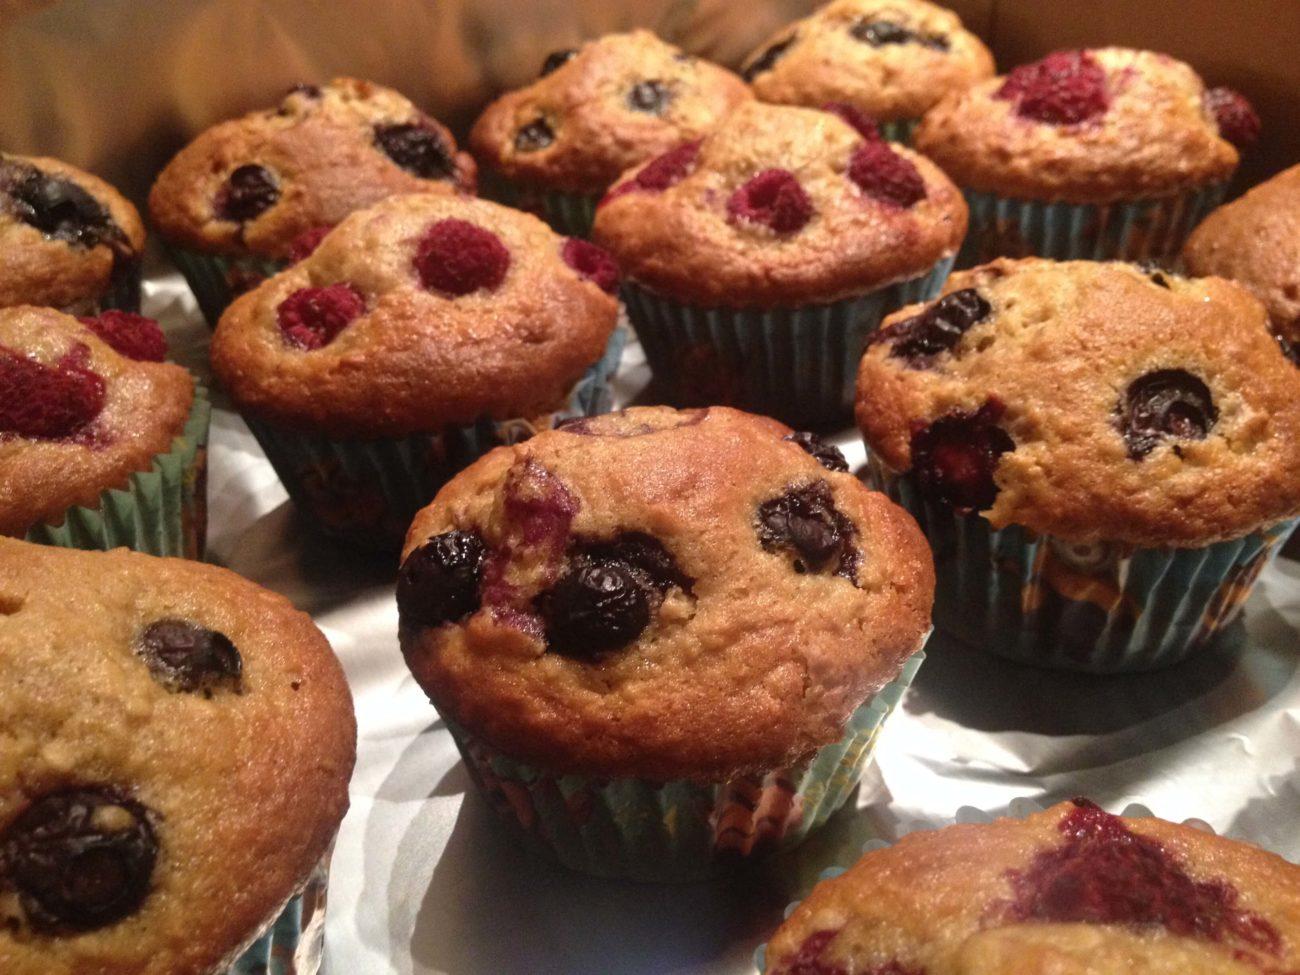 Himbeer-Heidelbeer Muffins